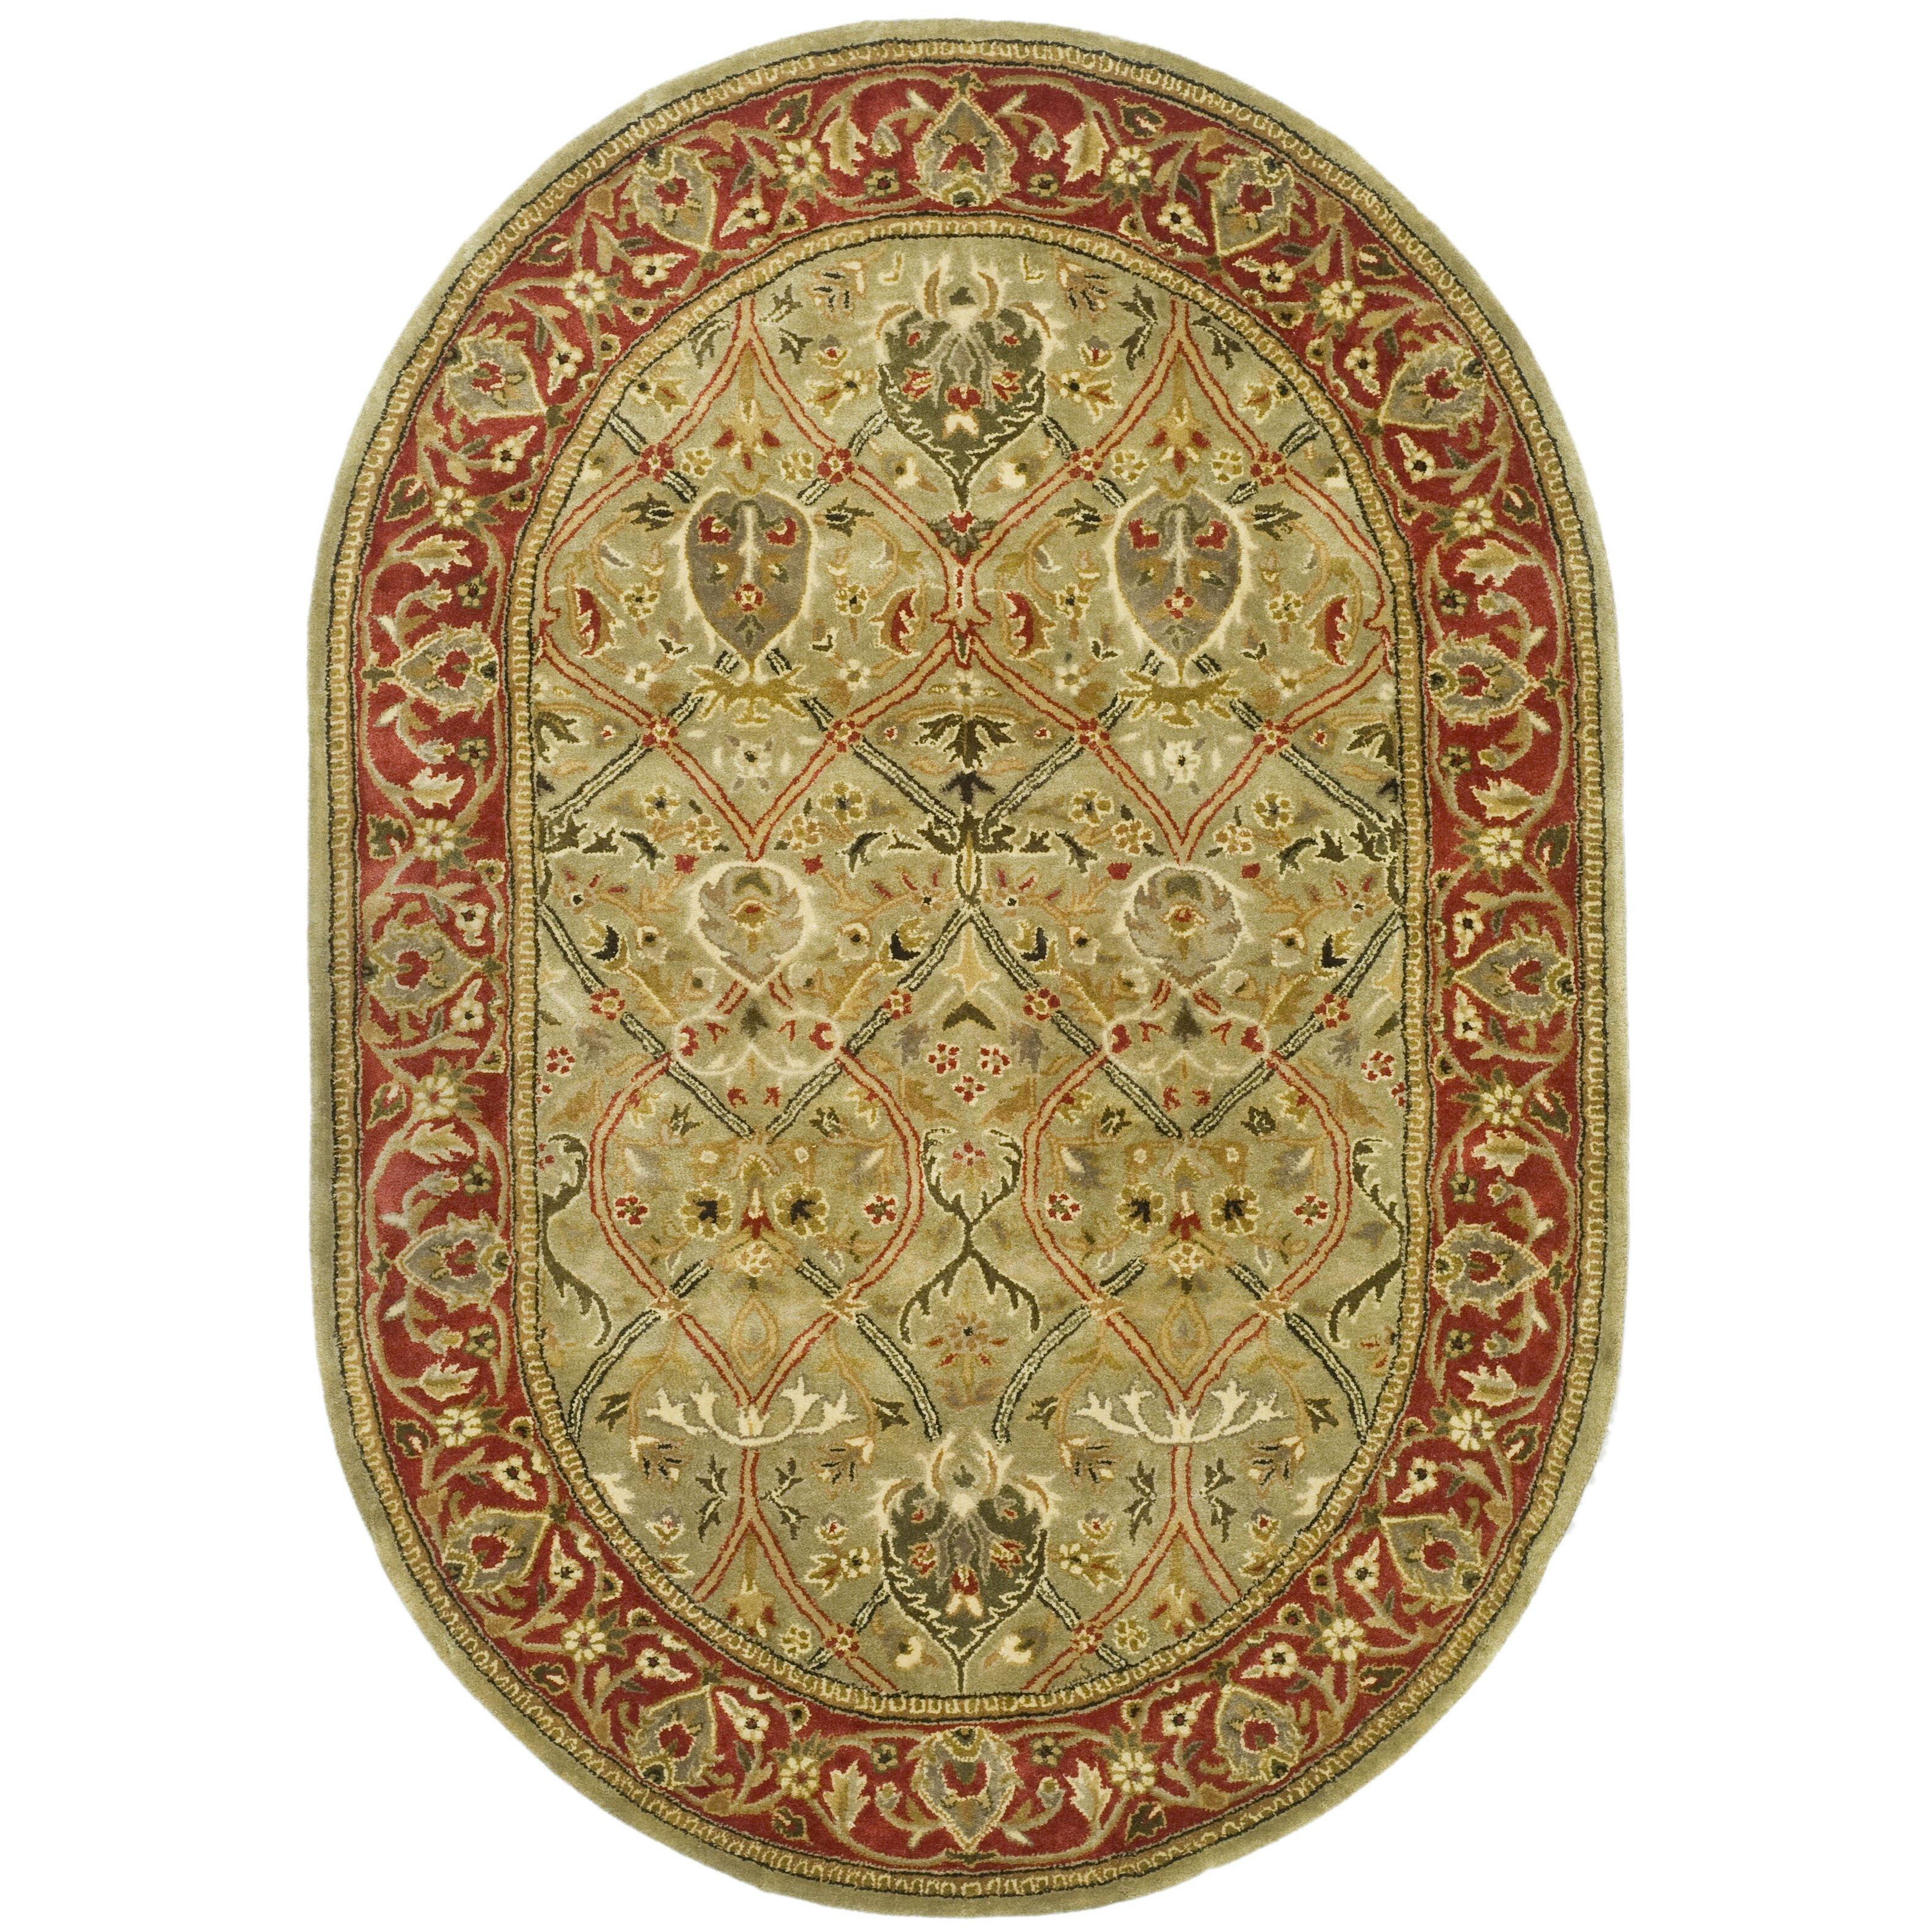 Safavieh Handmade Persian Legend Light Green Rust New: Safavieh Persian Legend Light Green & Rust Area Rug